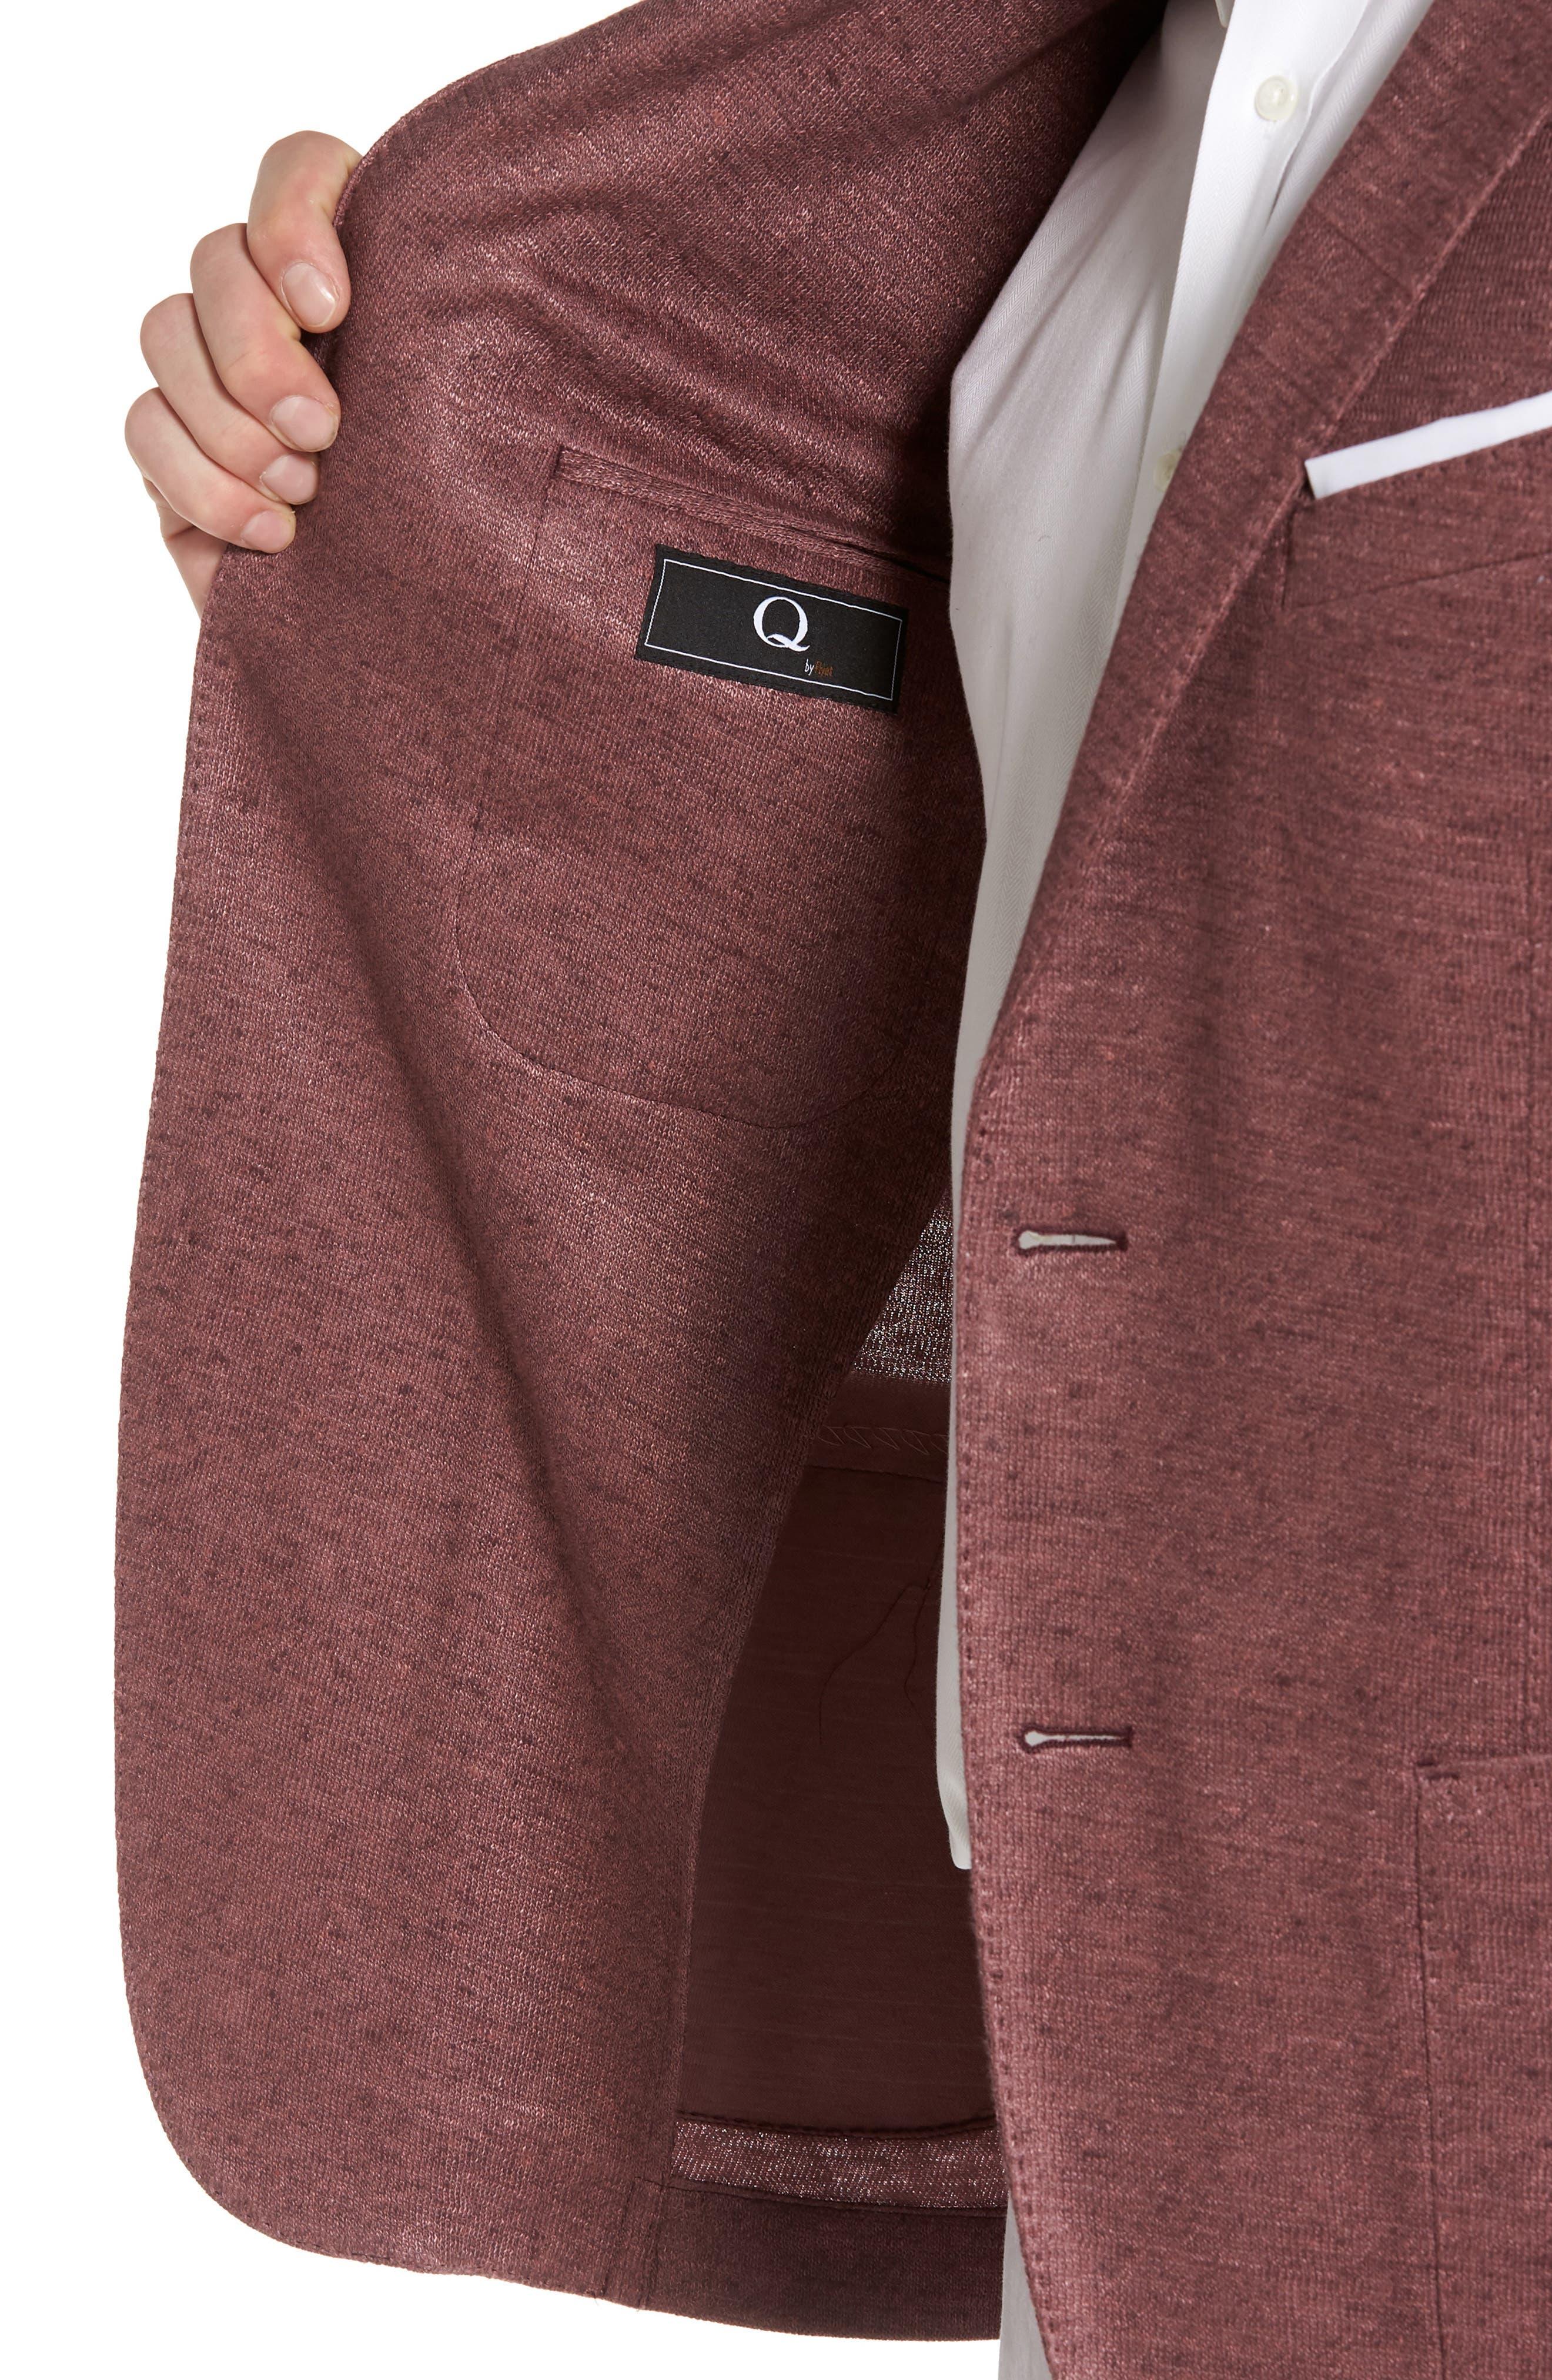 Trim Fit Heathered Jersey Blazer,                             Alternate thumbnail 4, color,                             651